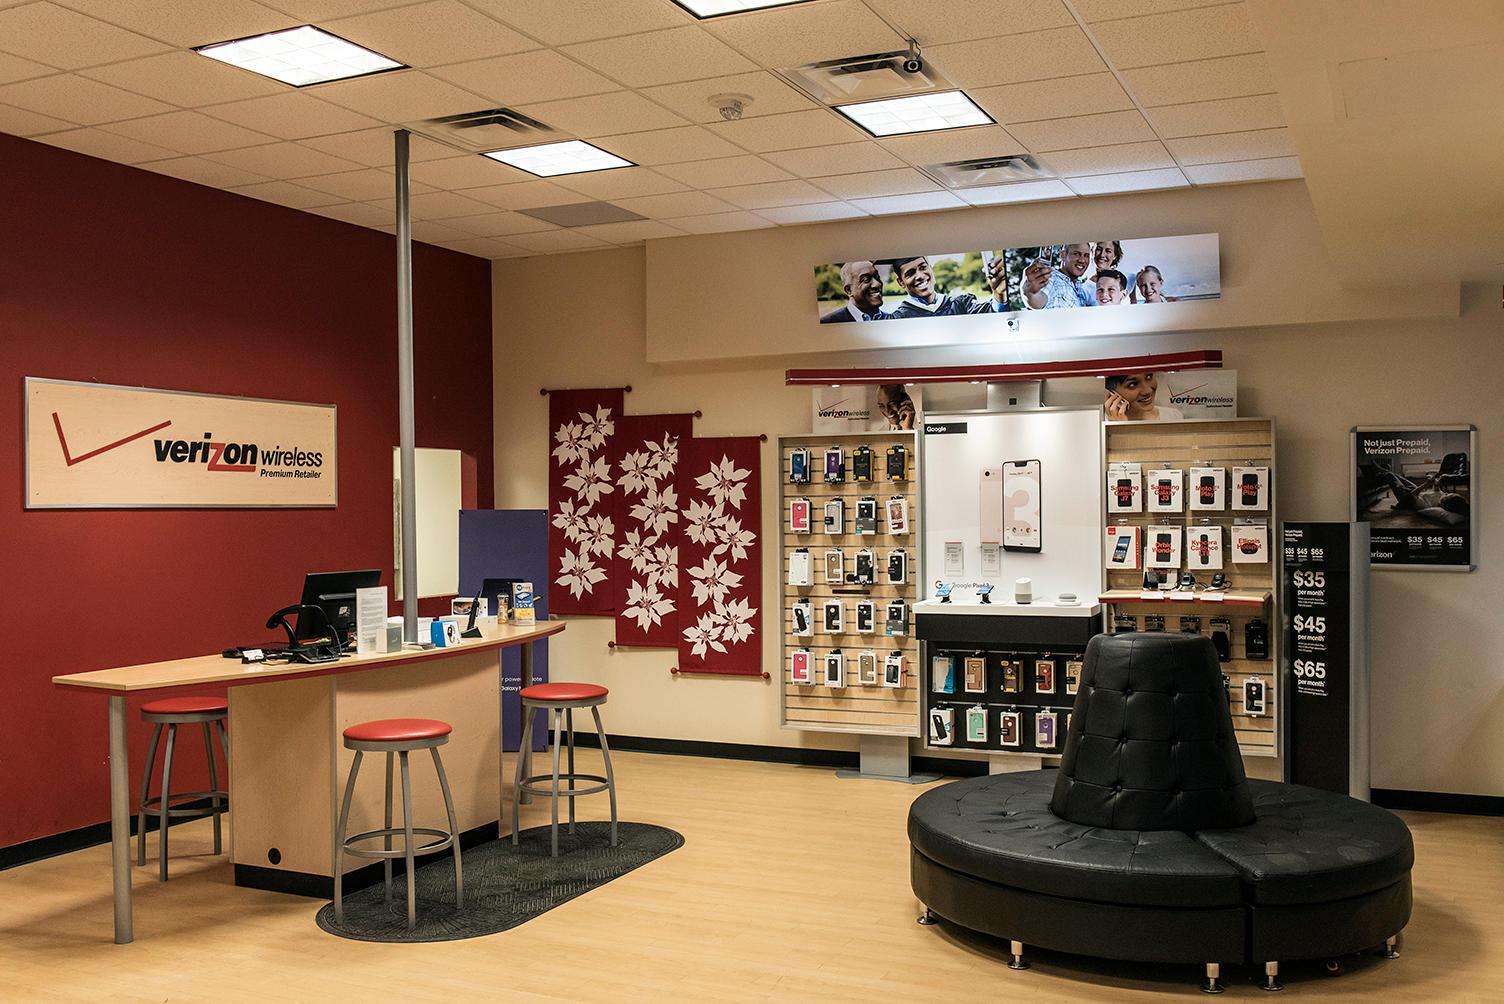 Verizon Authorized Retailer - Wireless Zone image 7